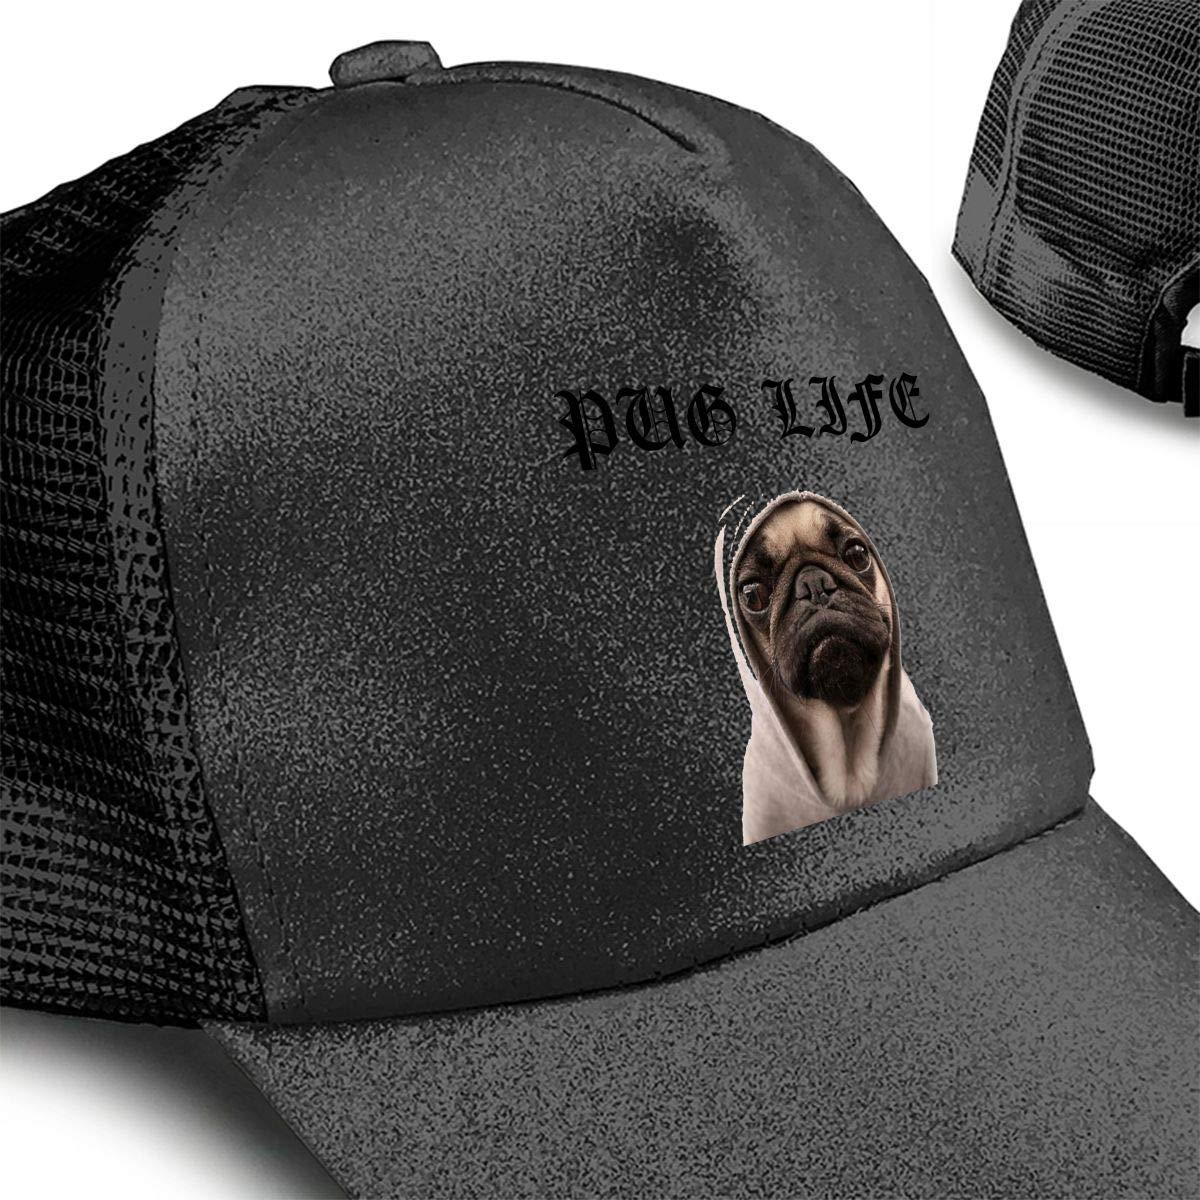 Pug Life Ponytail Messy High Bun Hat Ponycaps Baseball Cap Adjustable Trucker Cap Mesh Cap